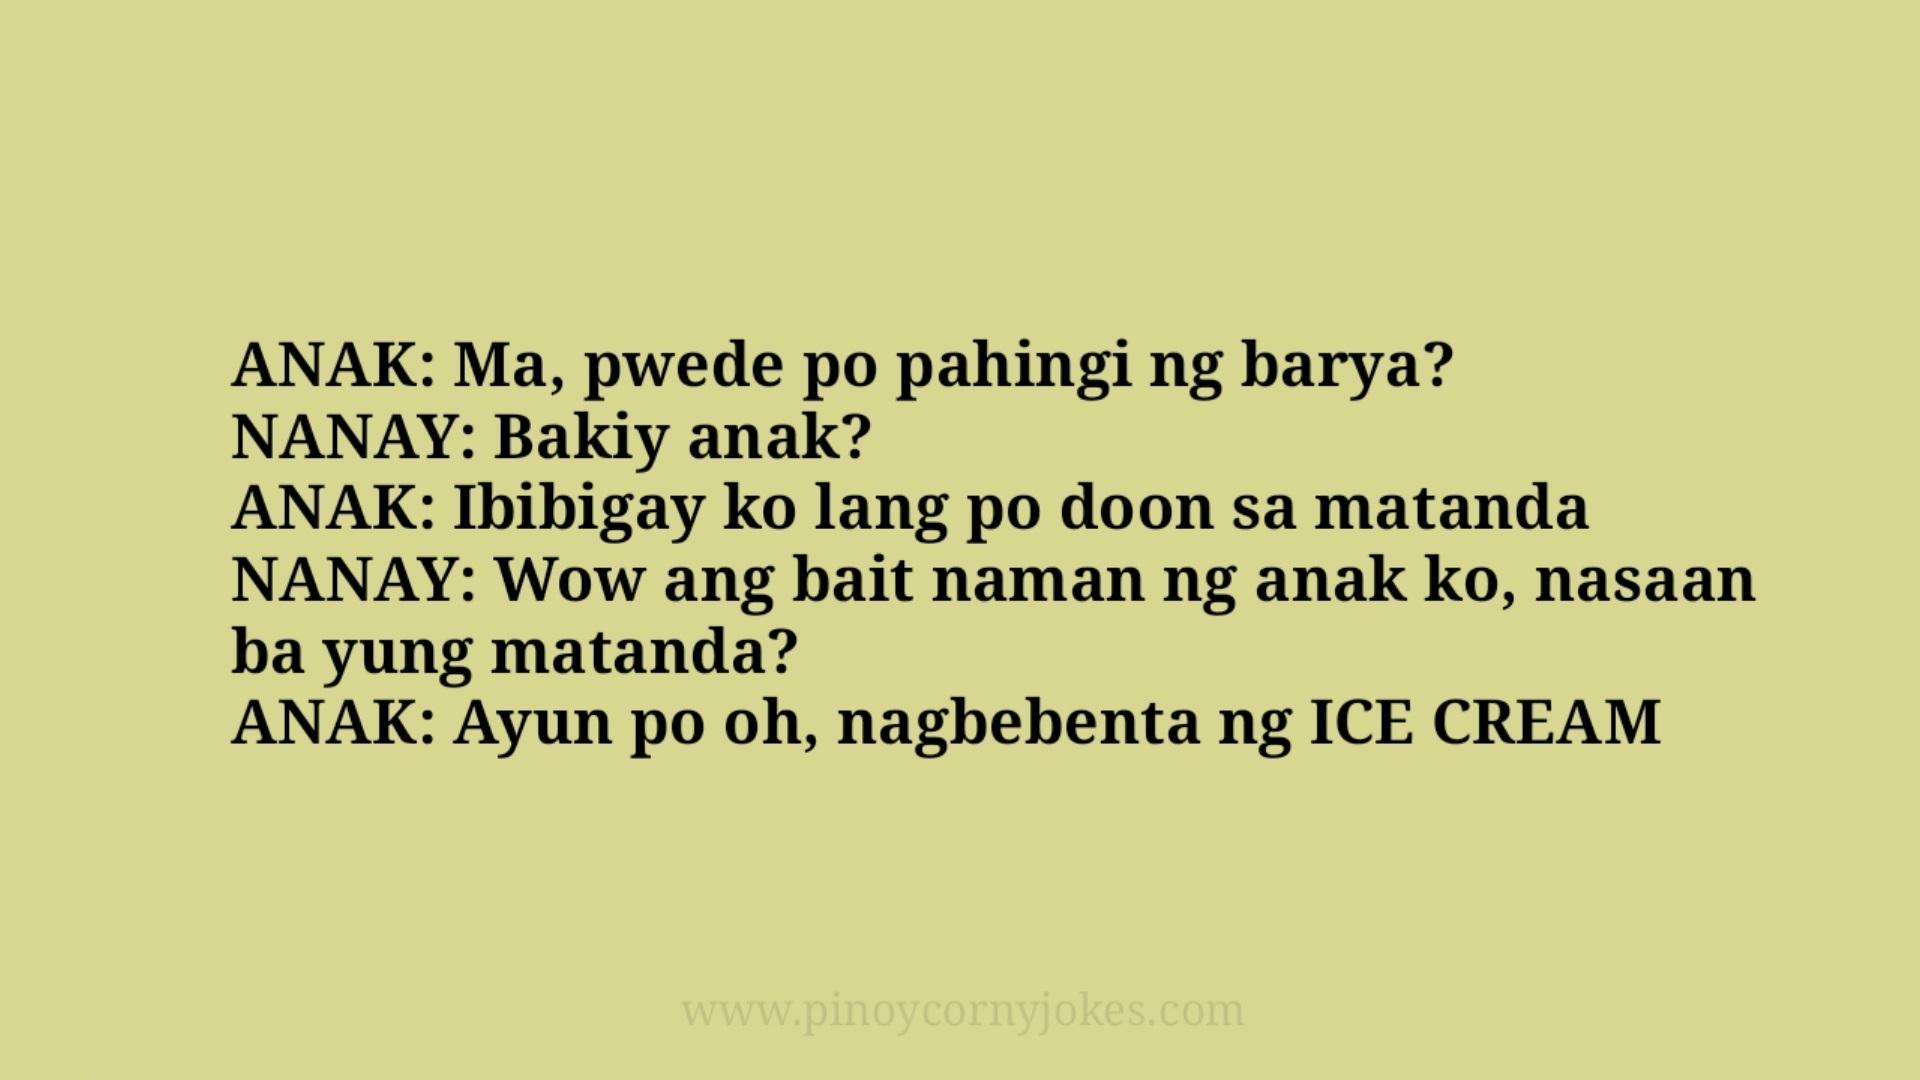 pahingi barya pinoy jokes 2021 family